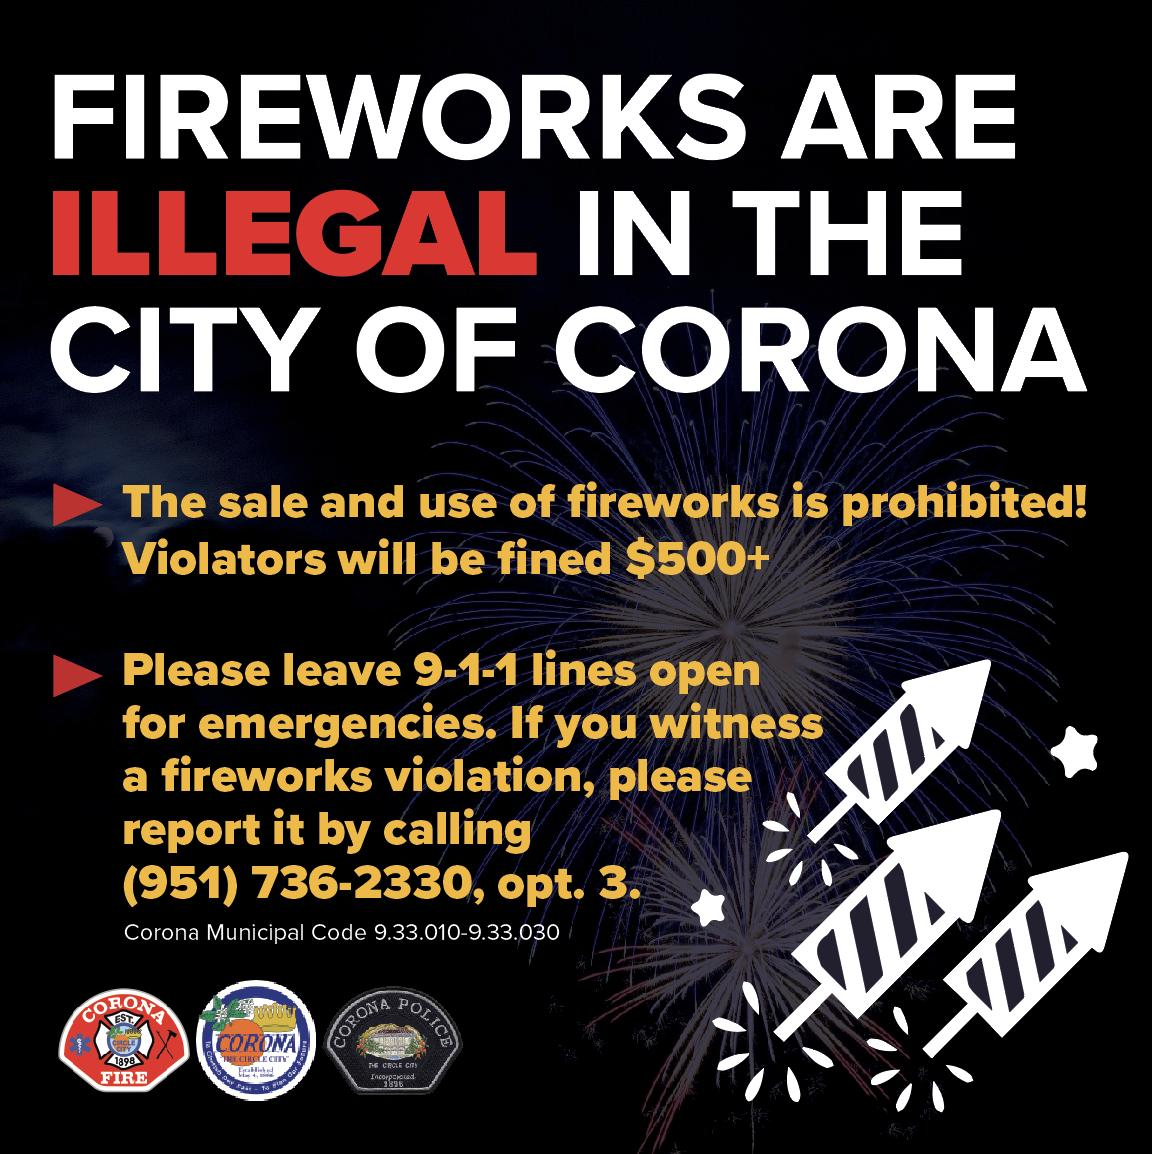 Corona Police Dept  on Twitter: